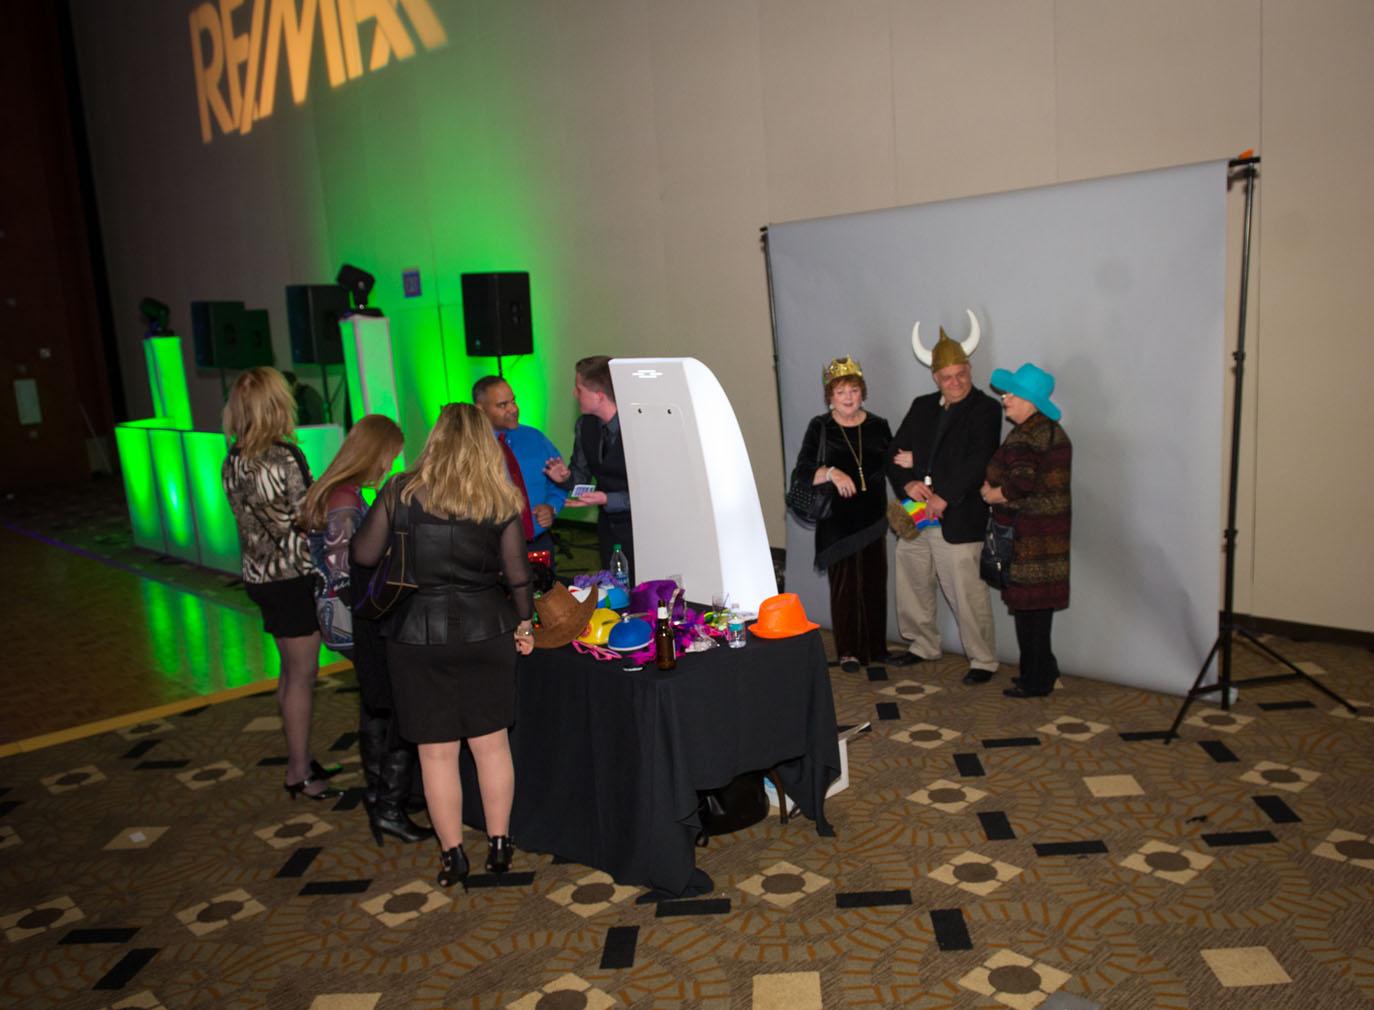 2015-12-09 ReMax Corpoarte Event - The Borgata - Atlantic City NJ - Photo Sesh - 2015-5062.jpg